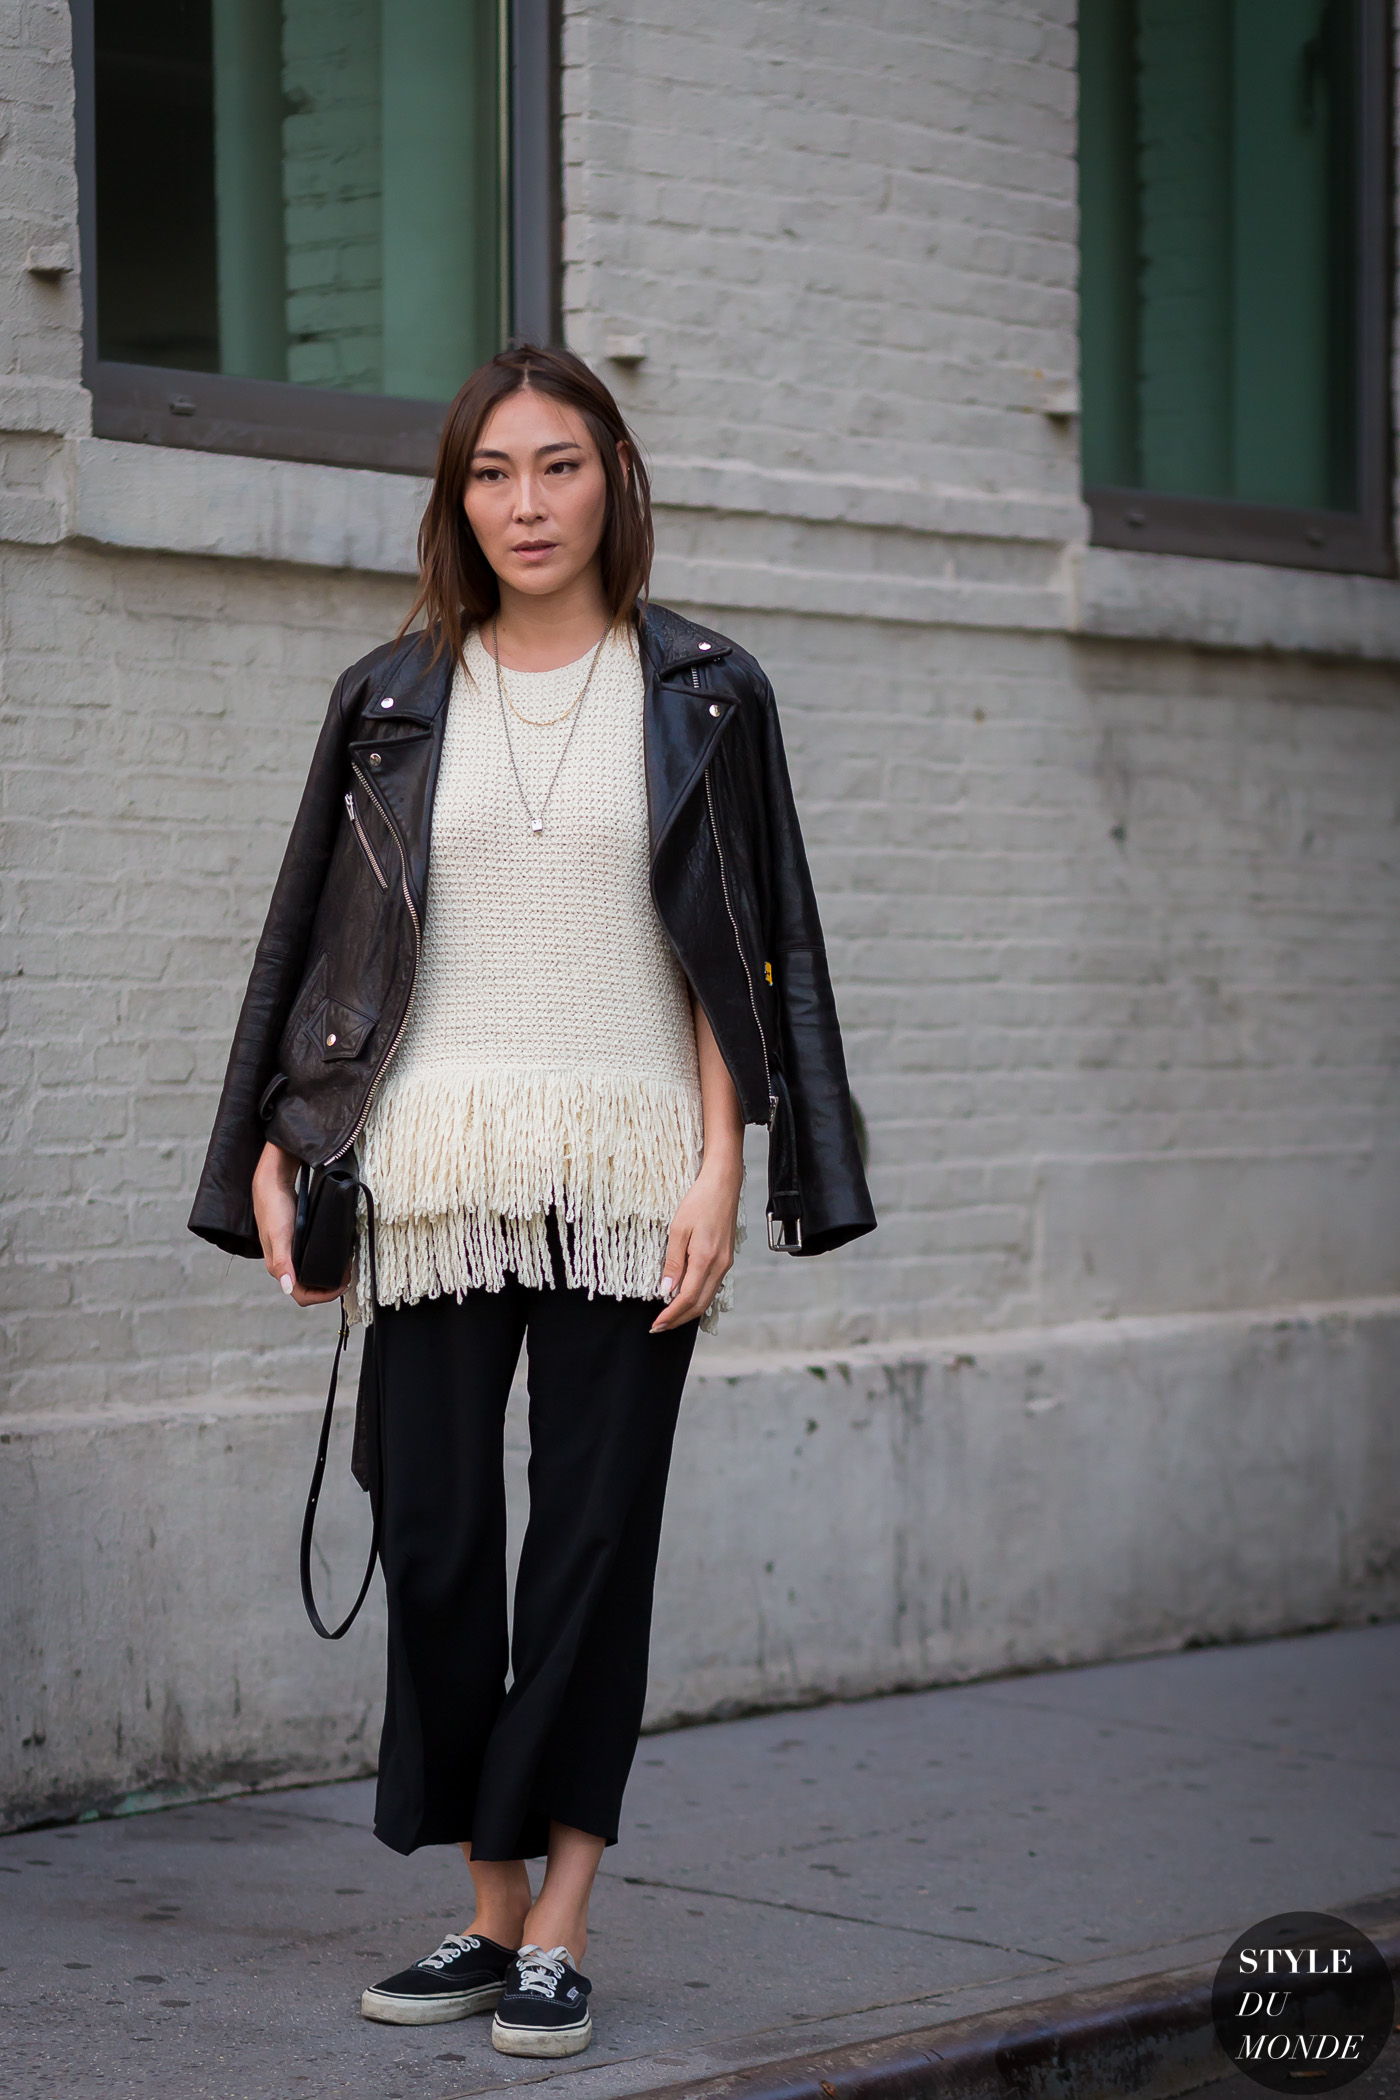 f4cc578380 Jayne Min by STYLEDUMONDE Street Style Fashion Photography